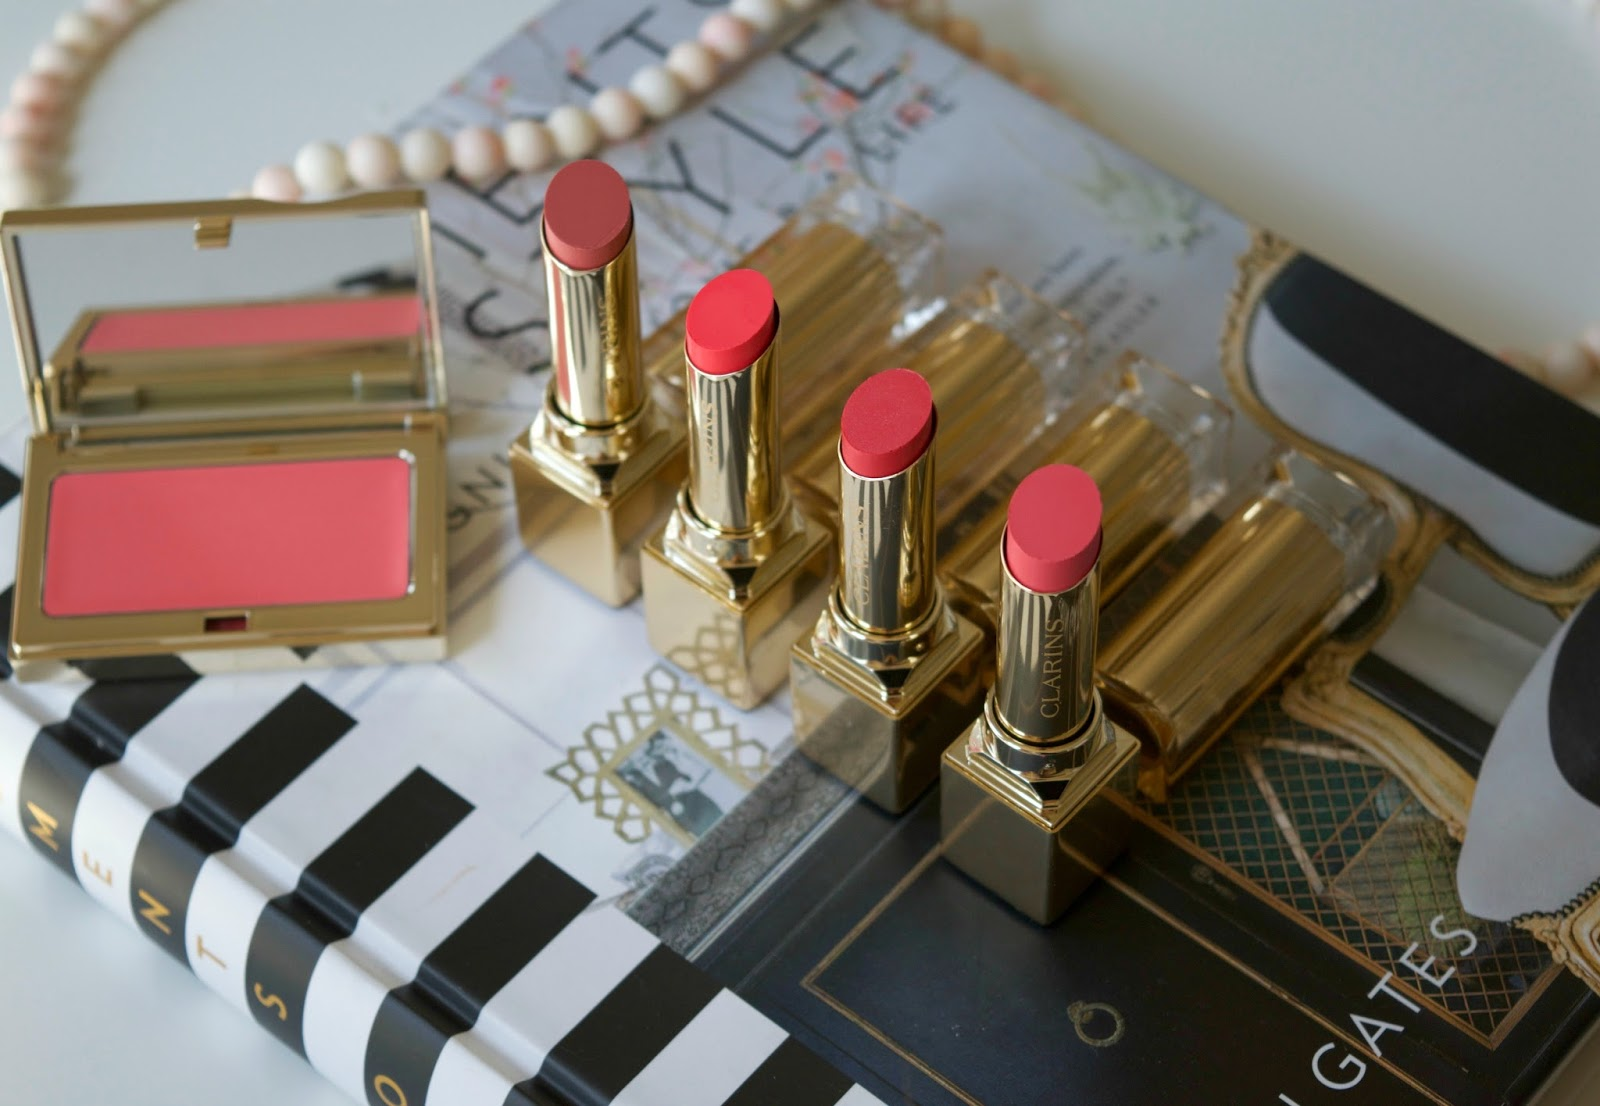 clarins lipstick - clarins creme blush - clarins spring makeup